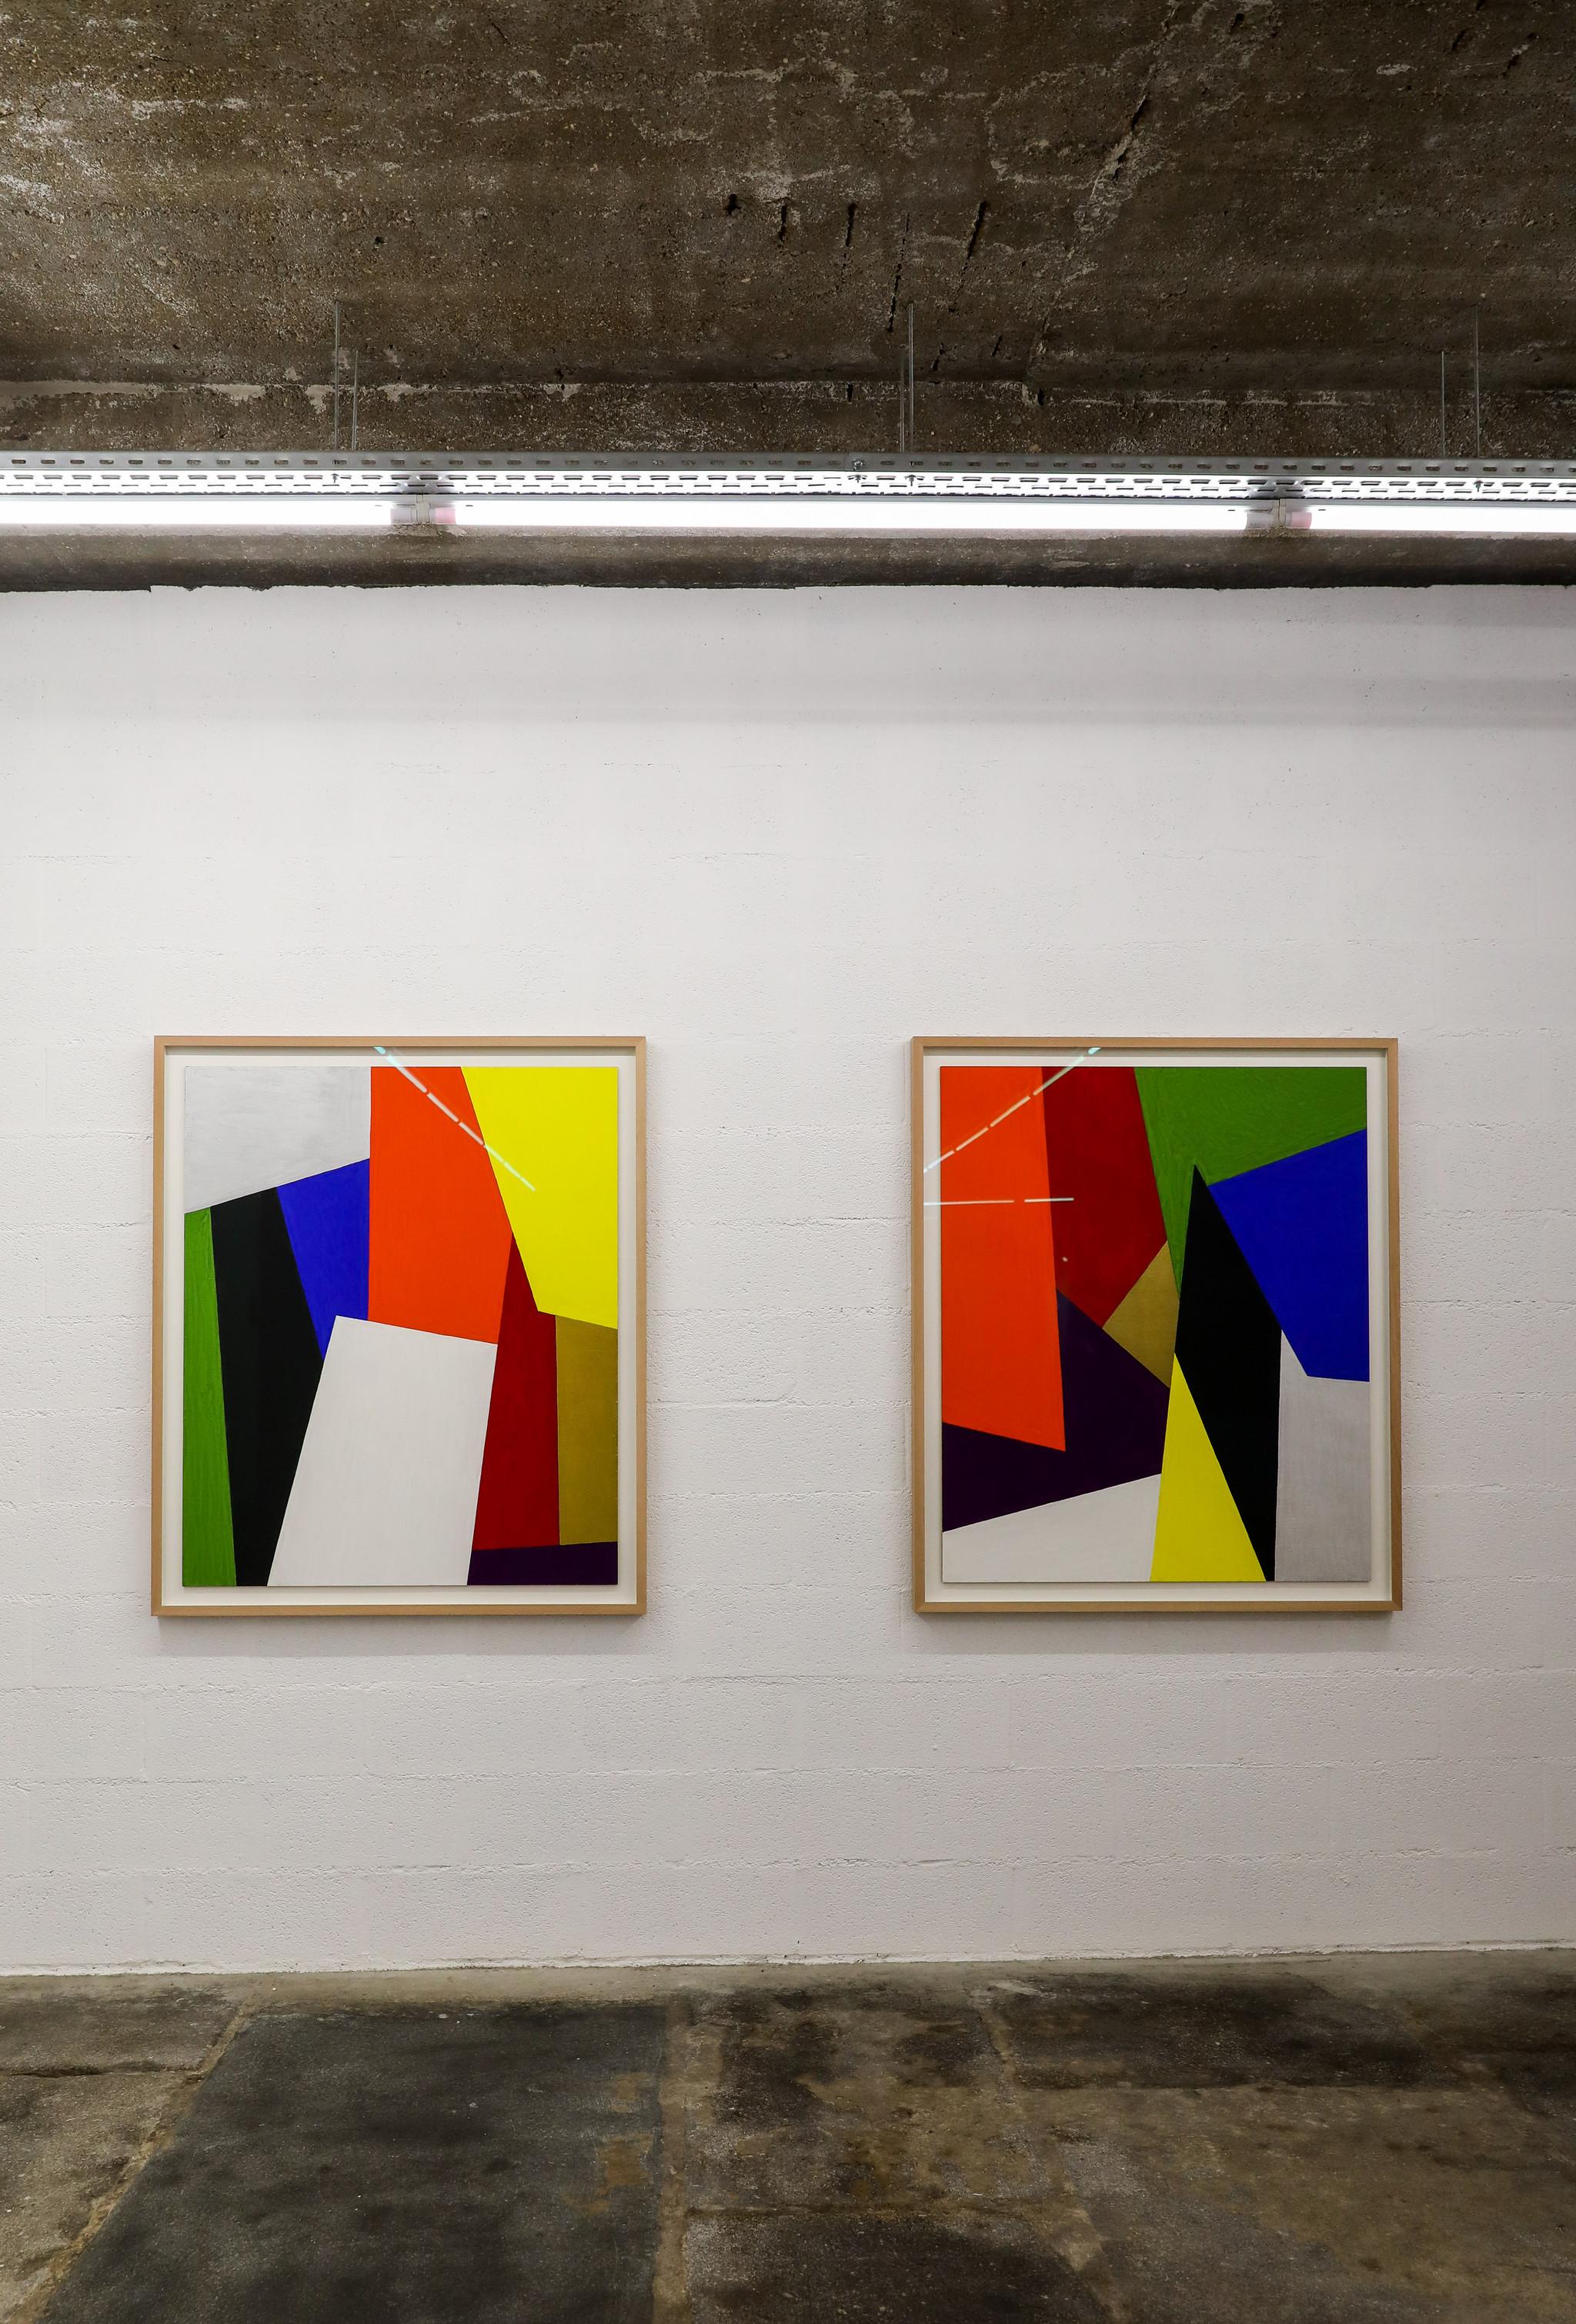 LM-Galeria Nuno Centeno 12-12-18-4.jpg